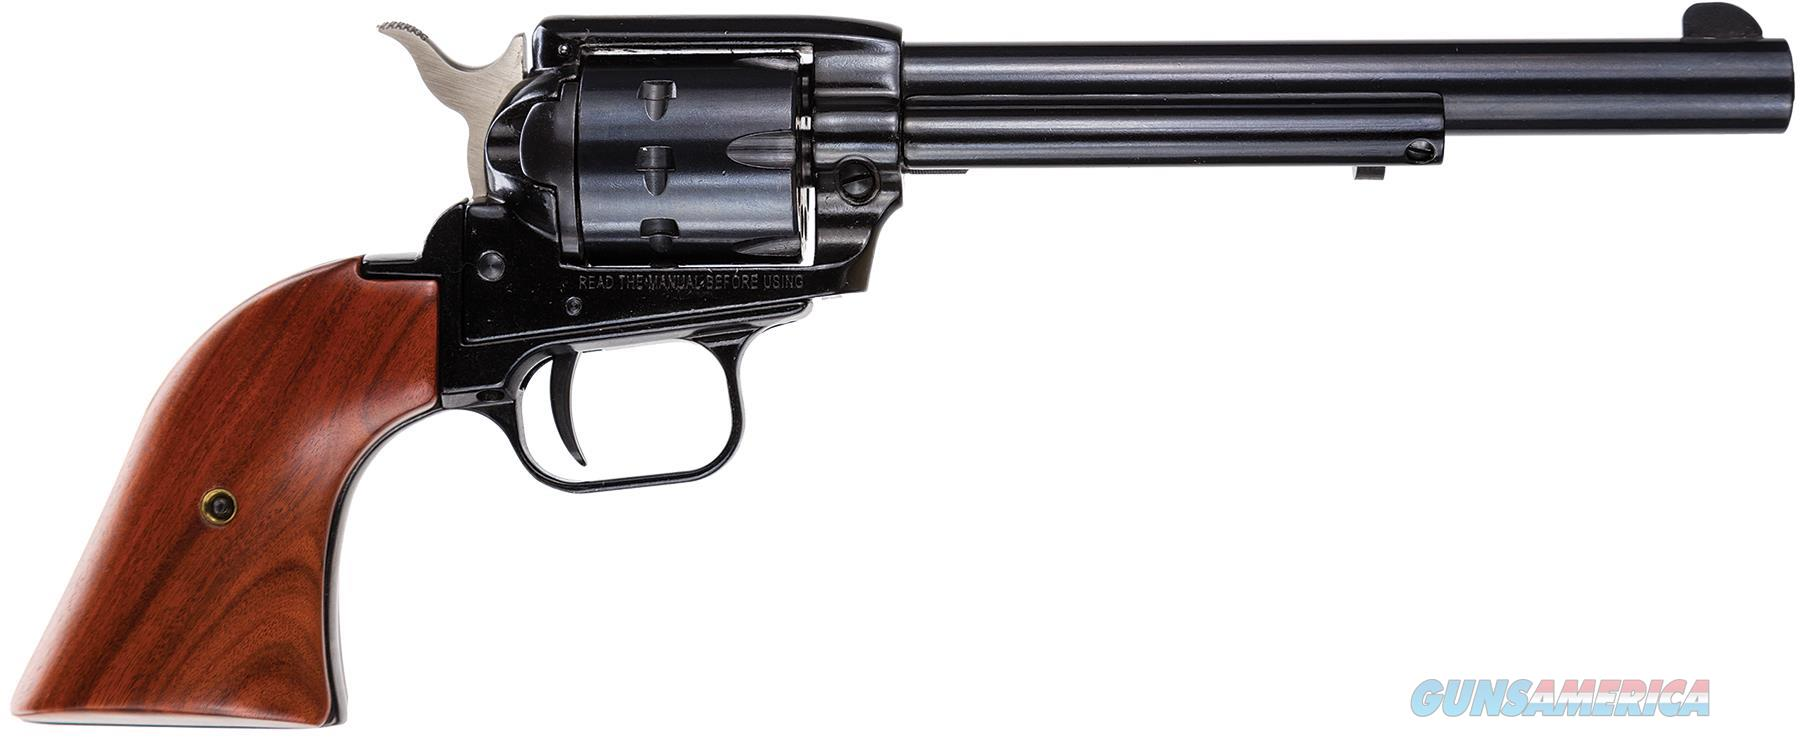 "Heritage Mfg Rr22999mb6 Rough Rider Small Bore Single 22 Long Rifle (Lr)/22 Wmr 6.5"" 9 Cocobolo Grip Blued RR22999MB6  Guns > Pistols > Heritage"